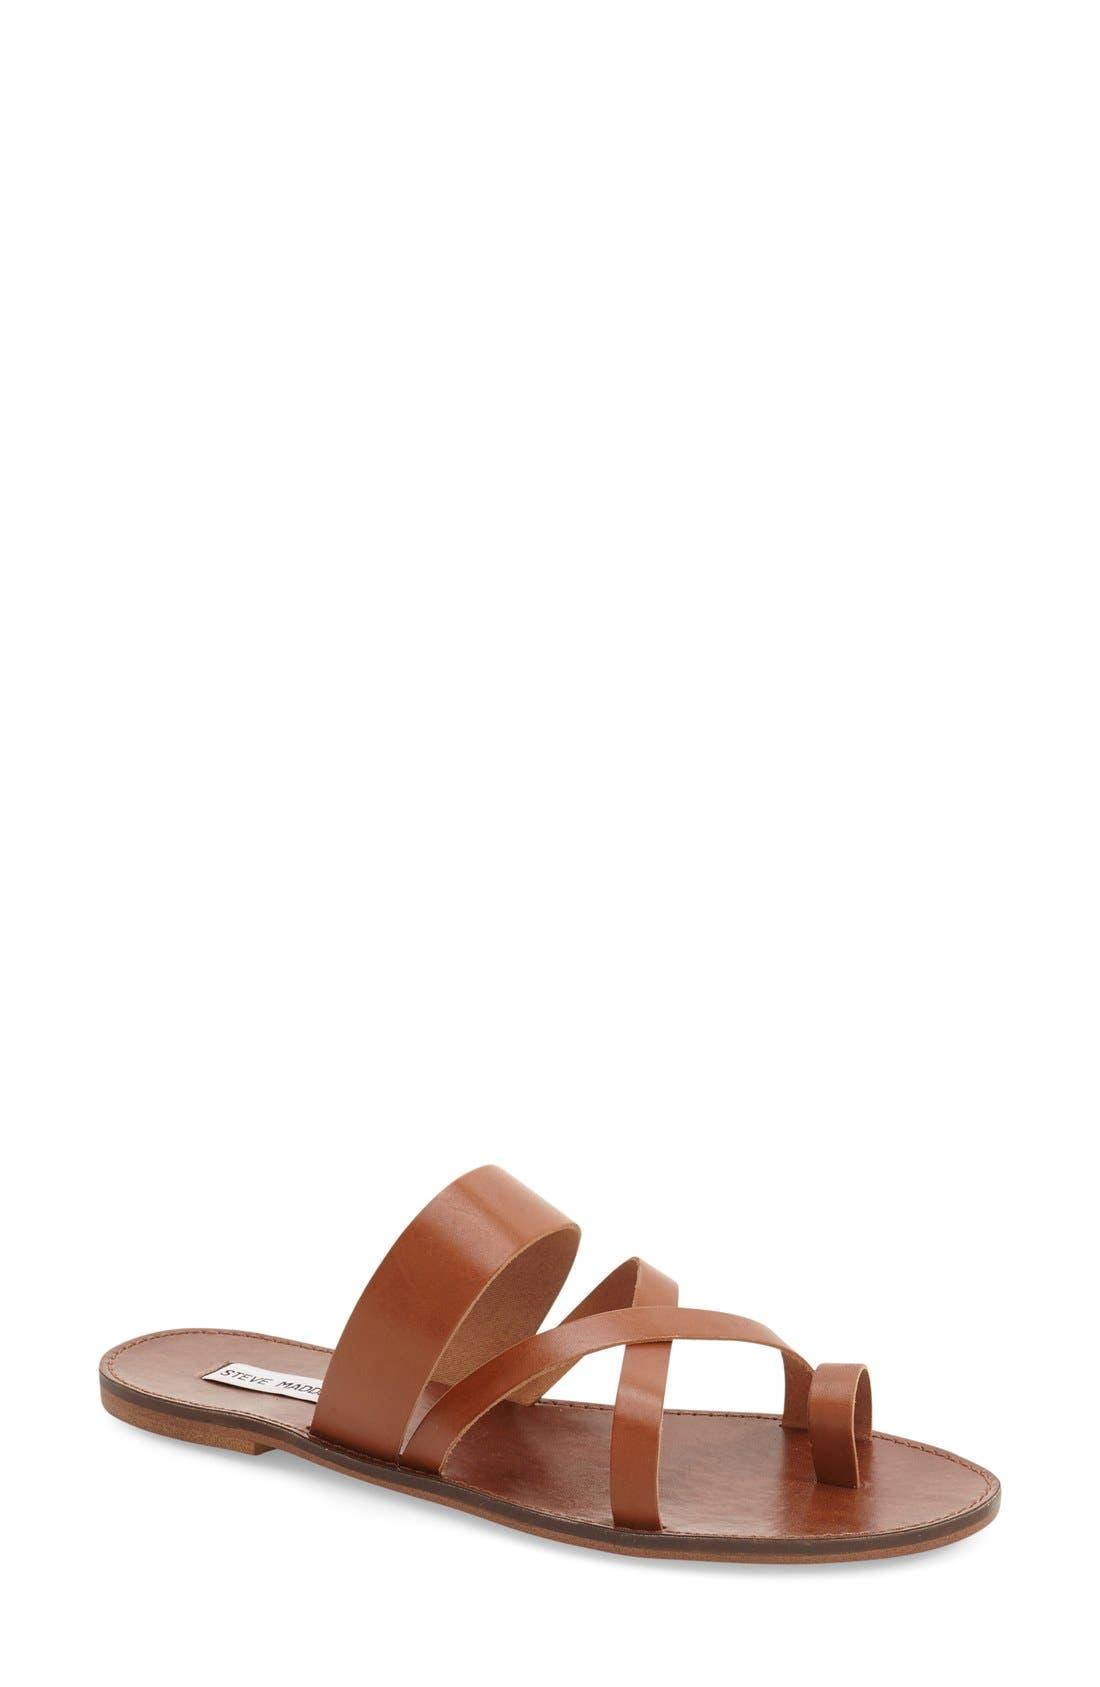 'Ambler' Sandal,                             Main thumbnail 1, color,                             Tan Leather